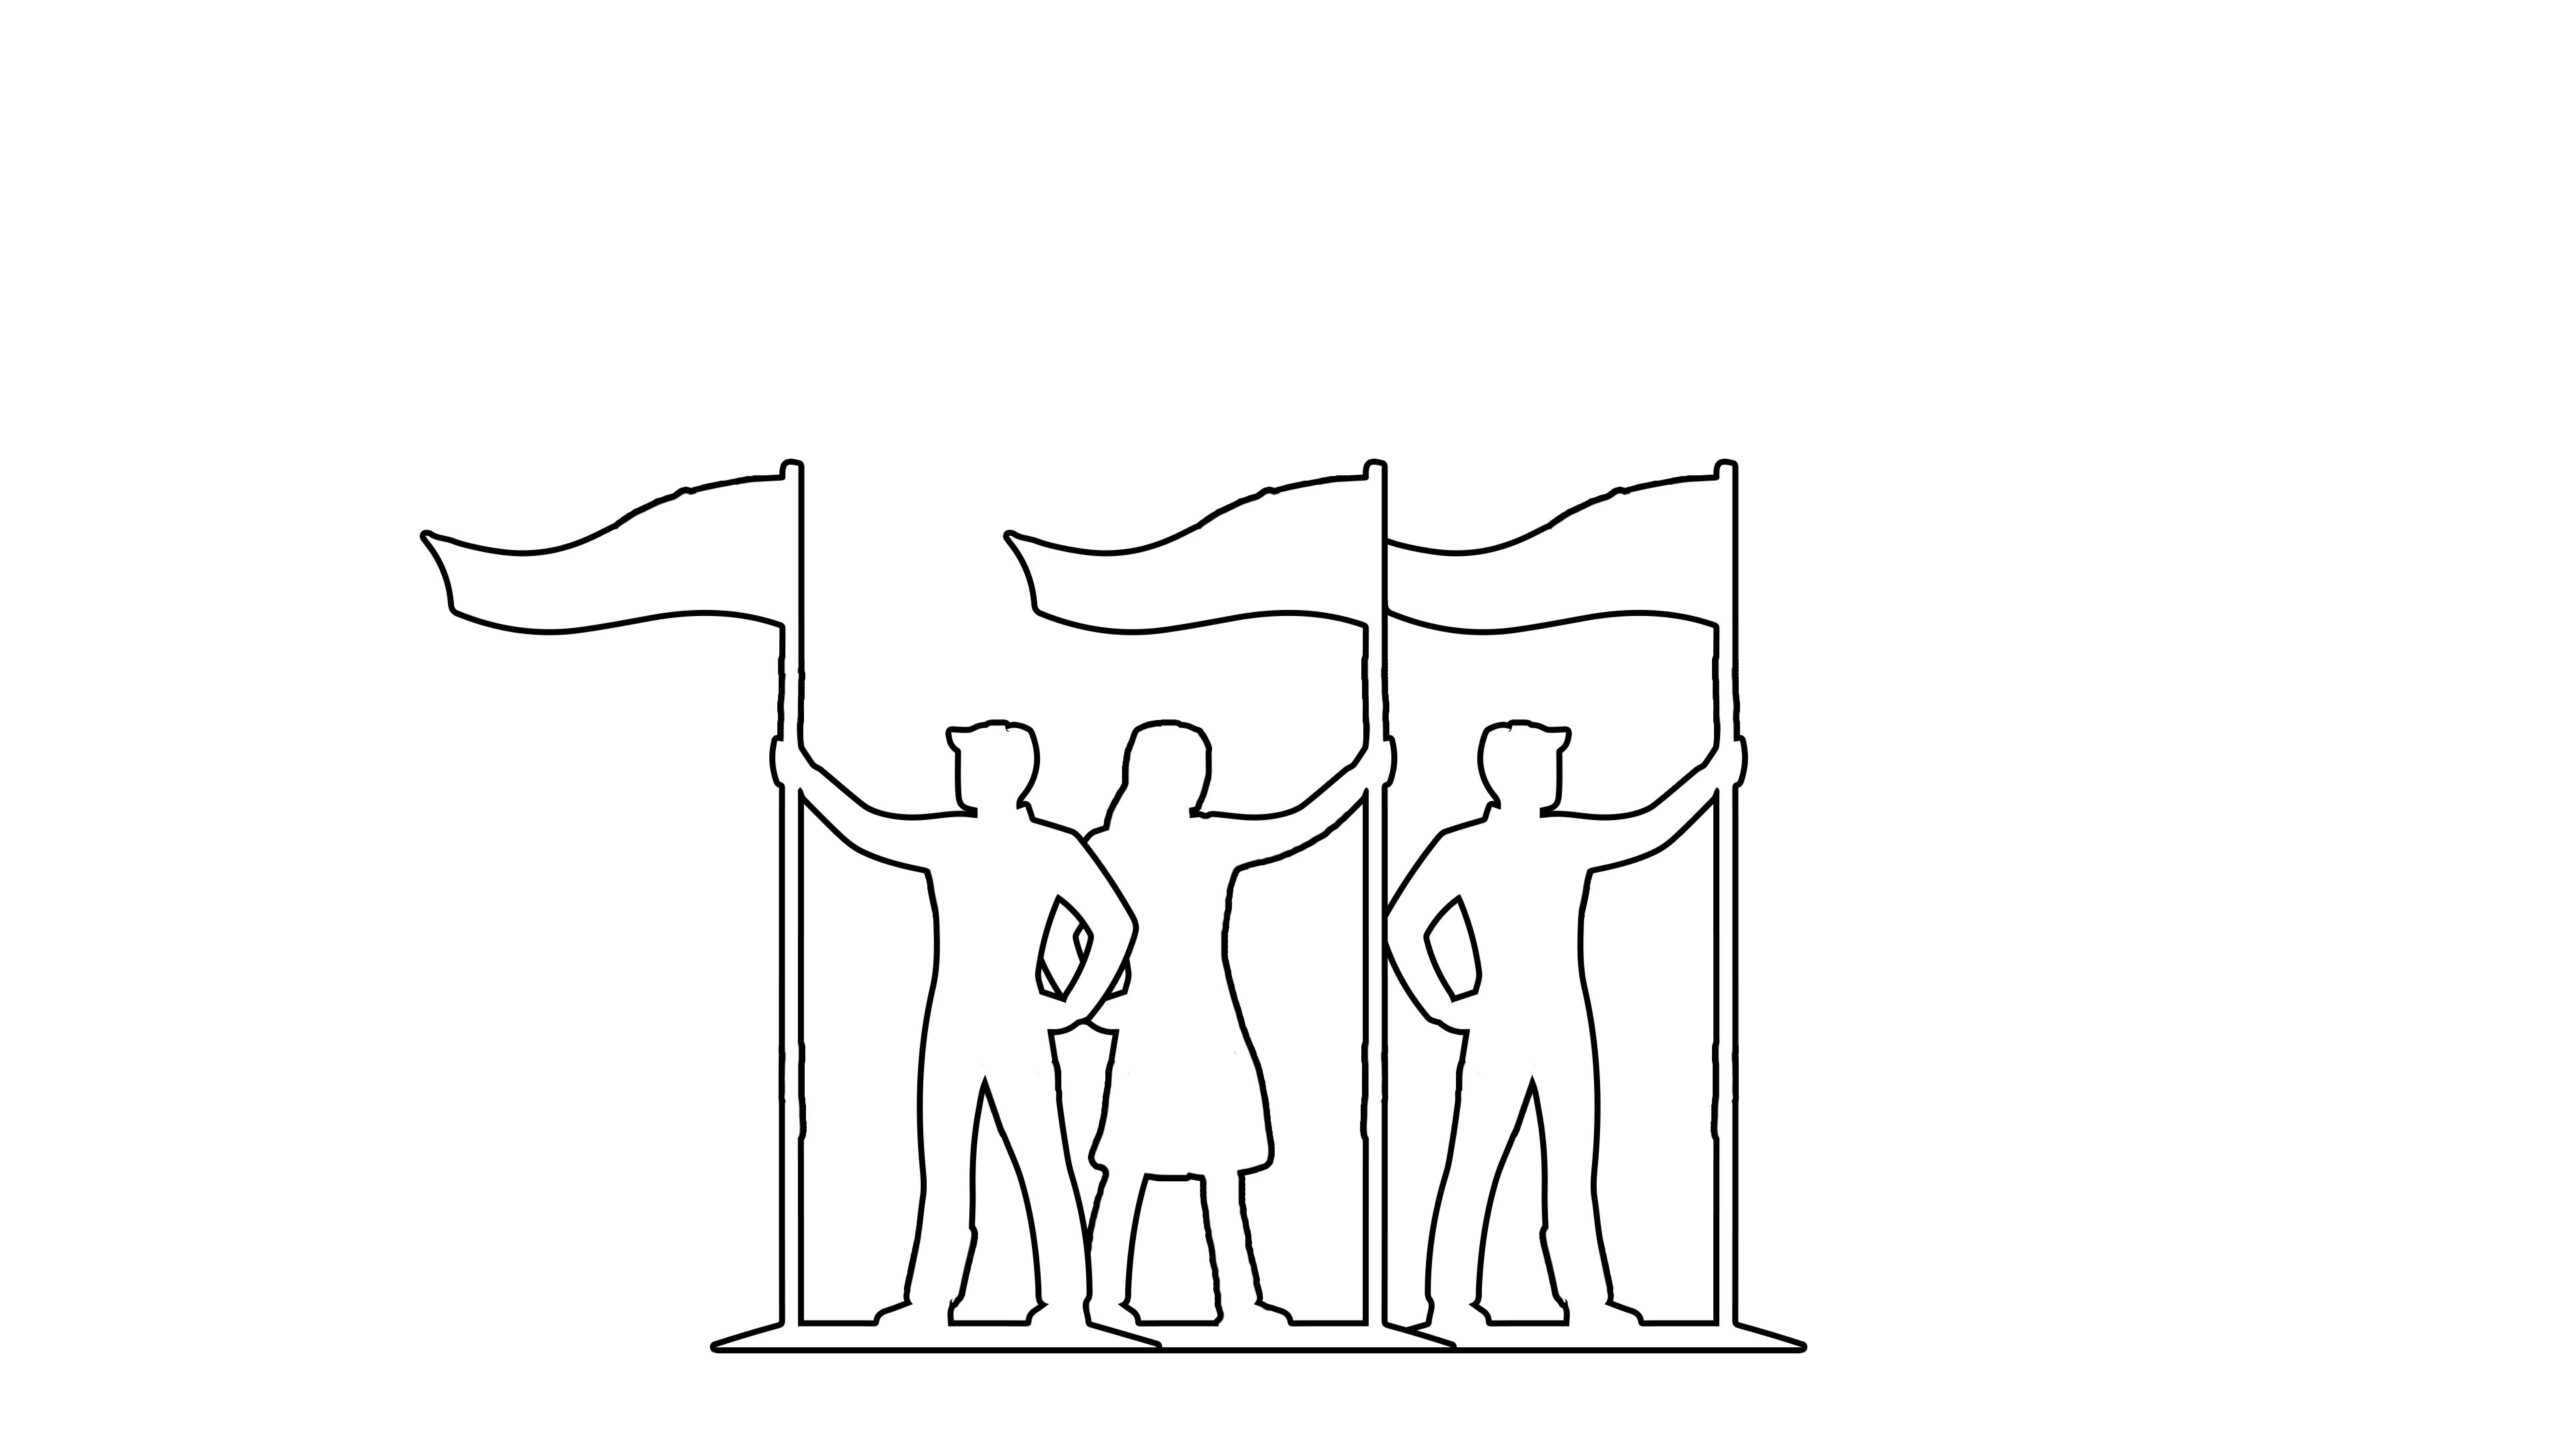 Privacy_Incident_Sketchboard_0316-copy